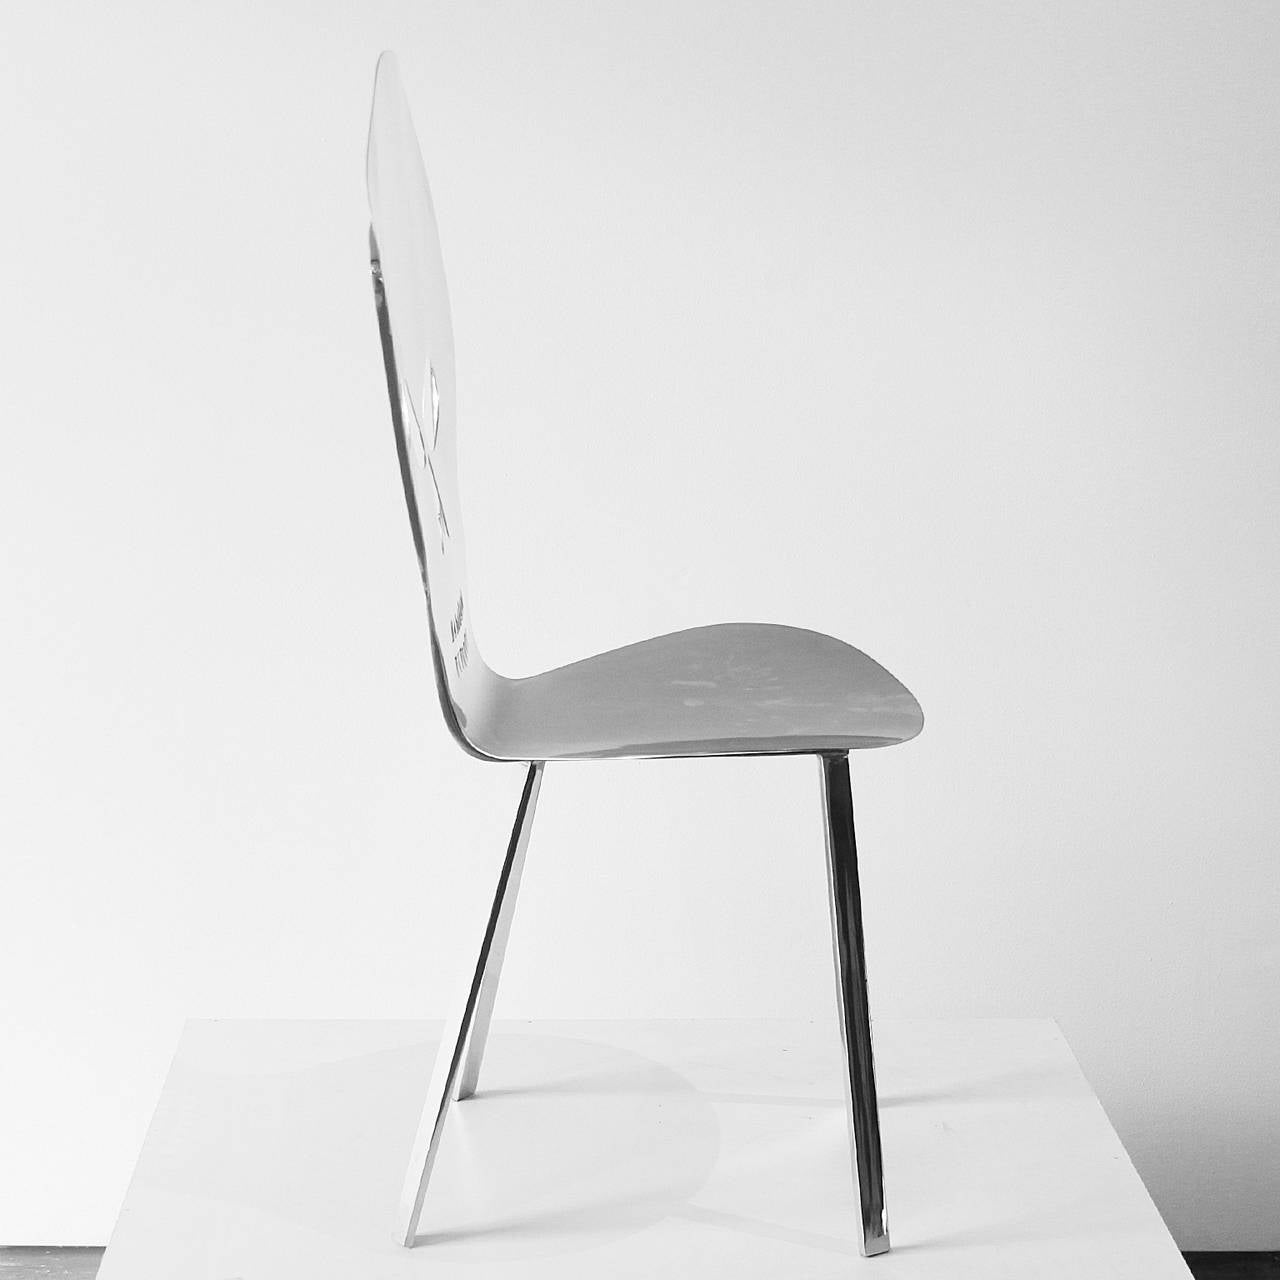 skull chair office accessories cadeira caveira inox by alê jordão for